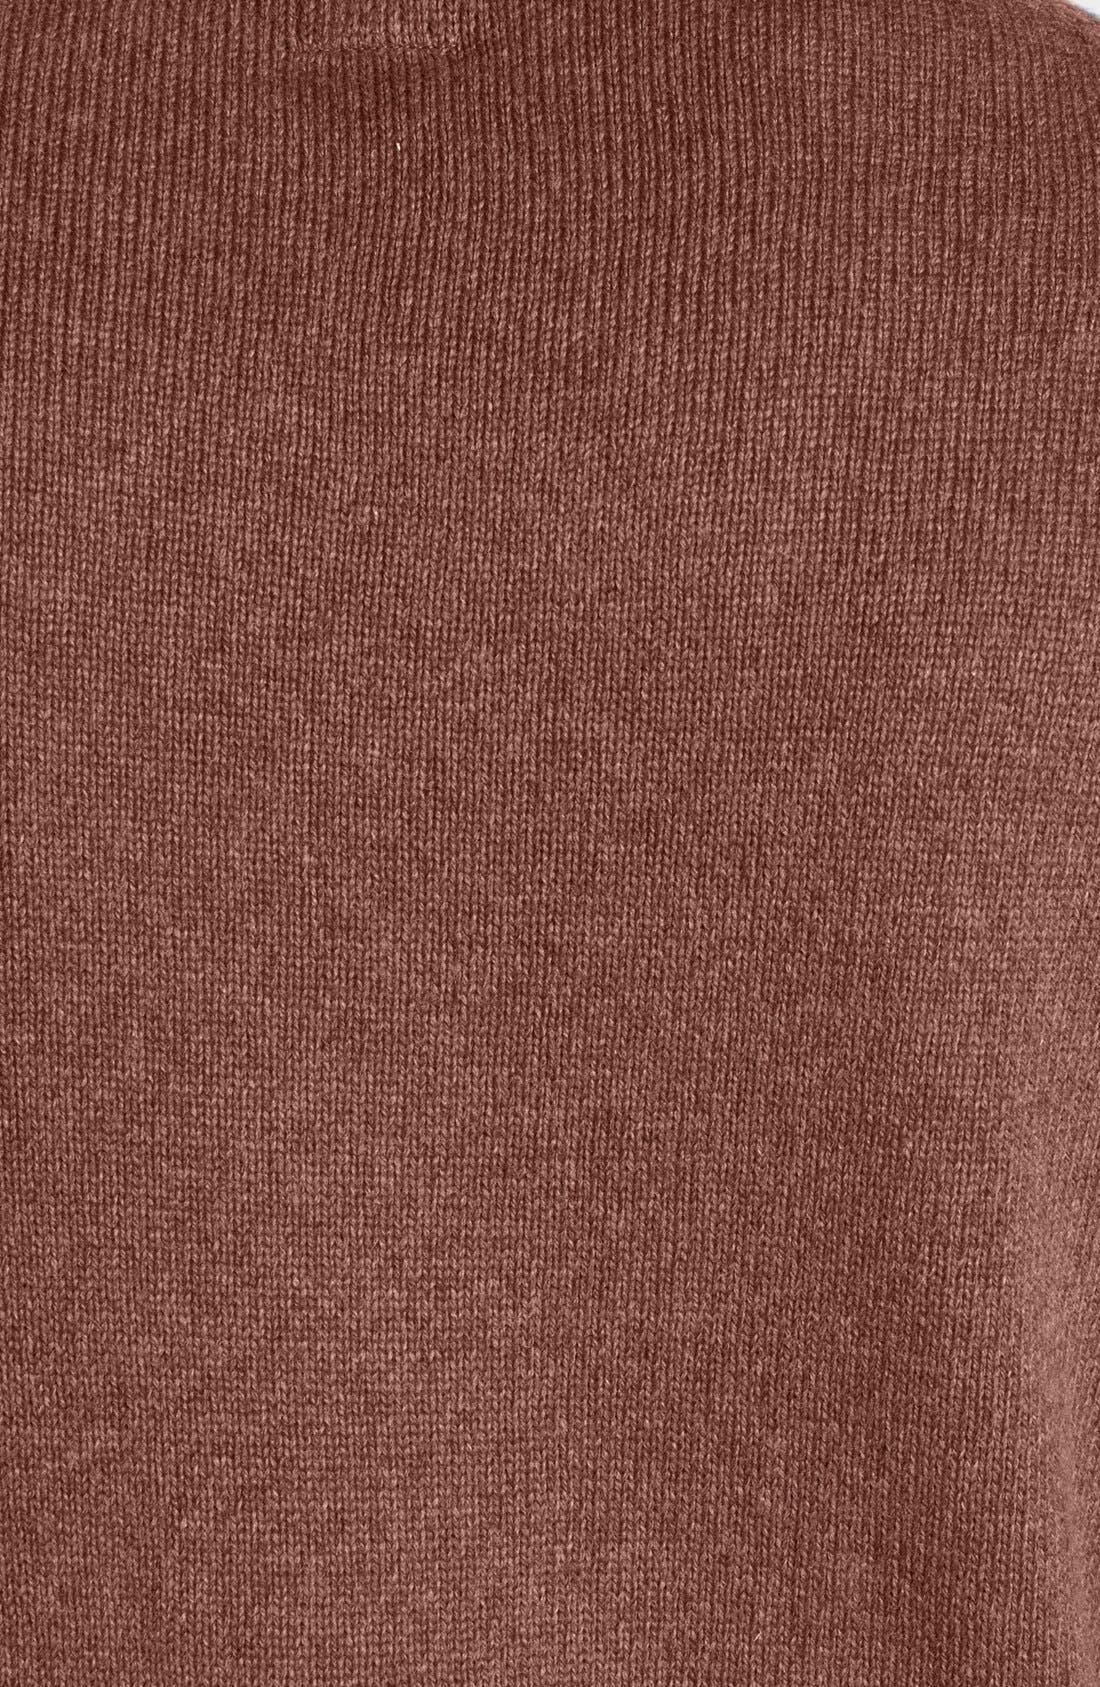 Alternate Image 3  - RVCA 'Briza' Crewneck Sweater